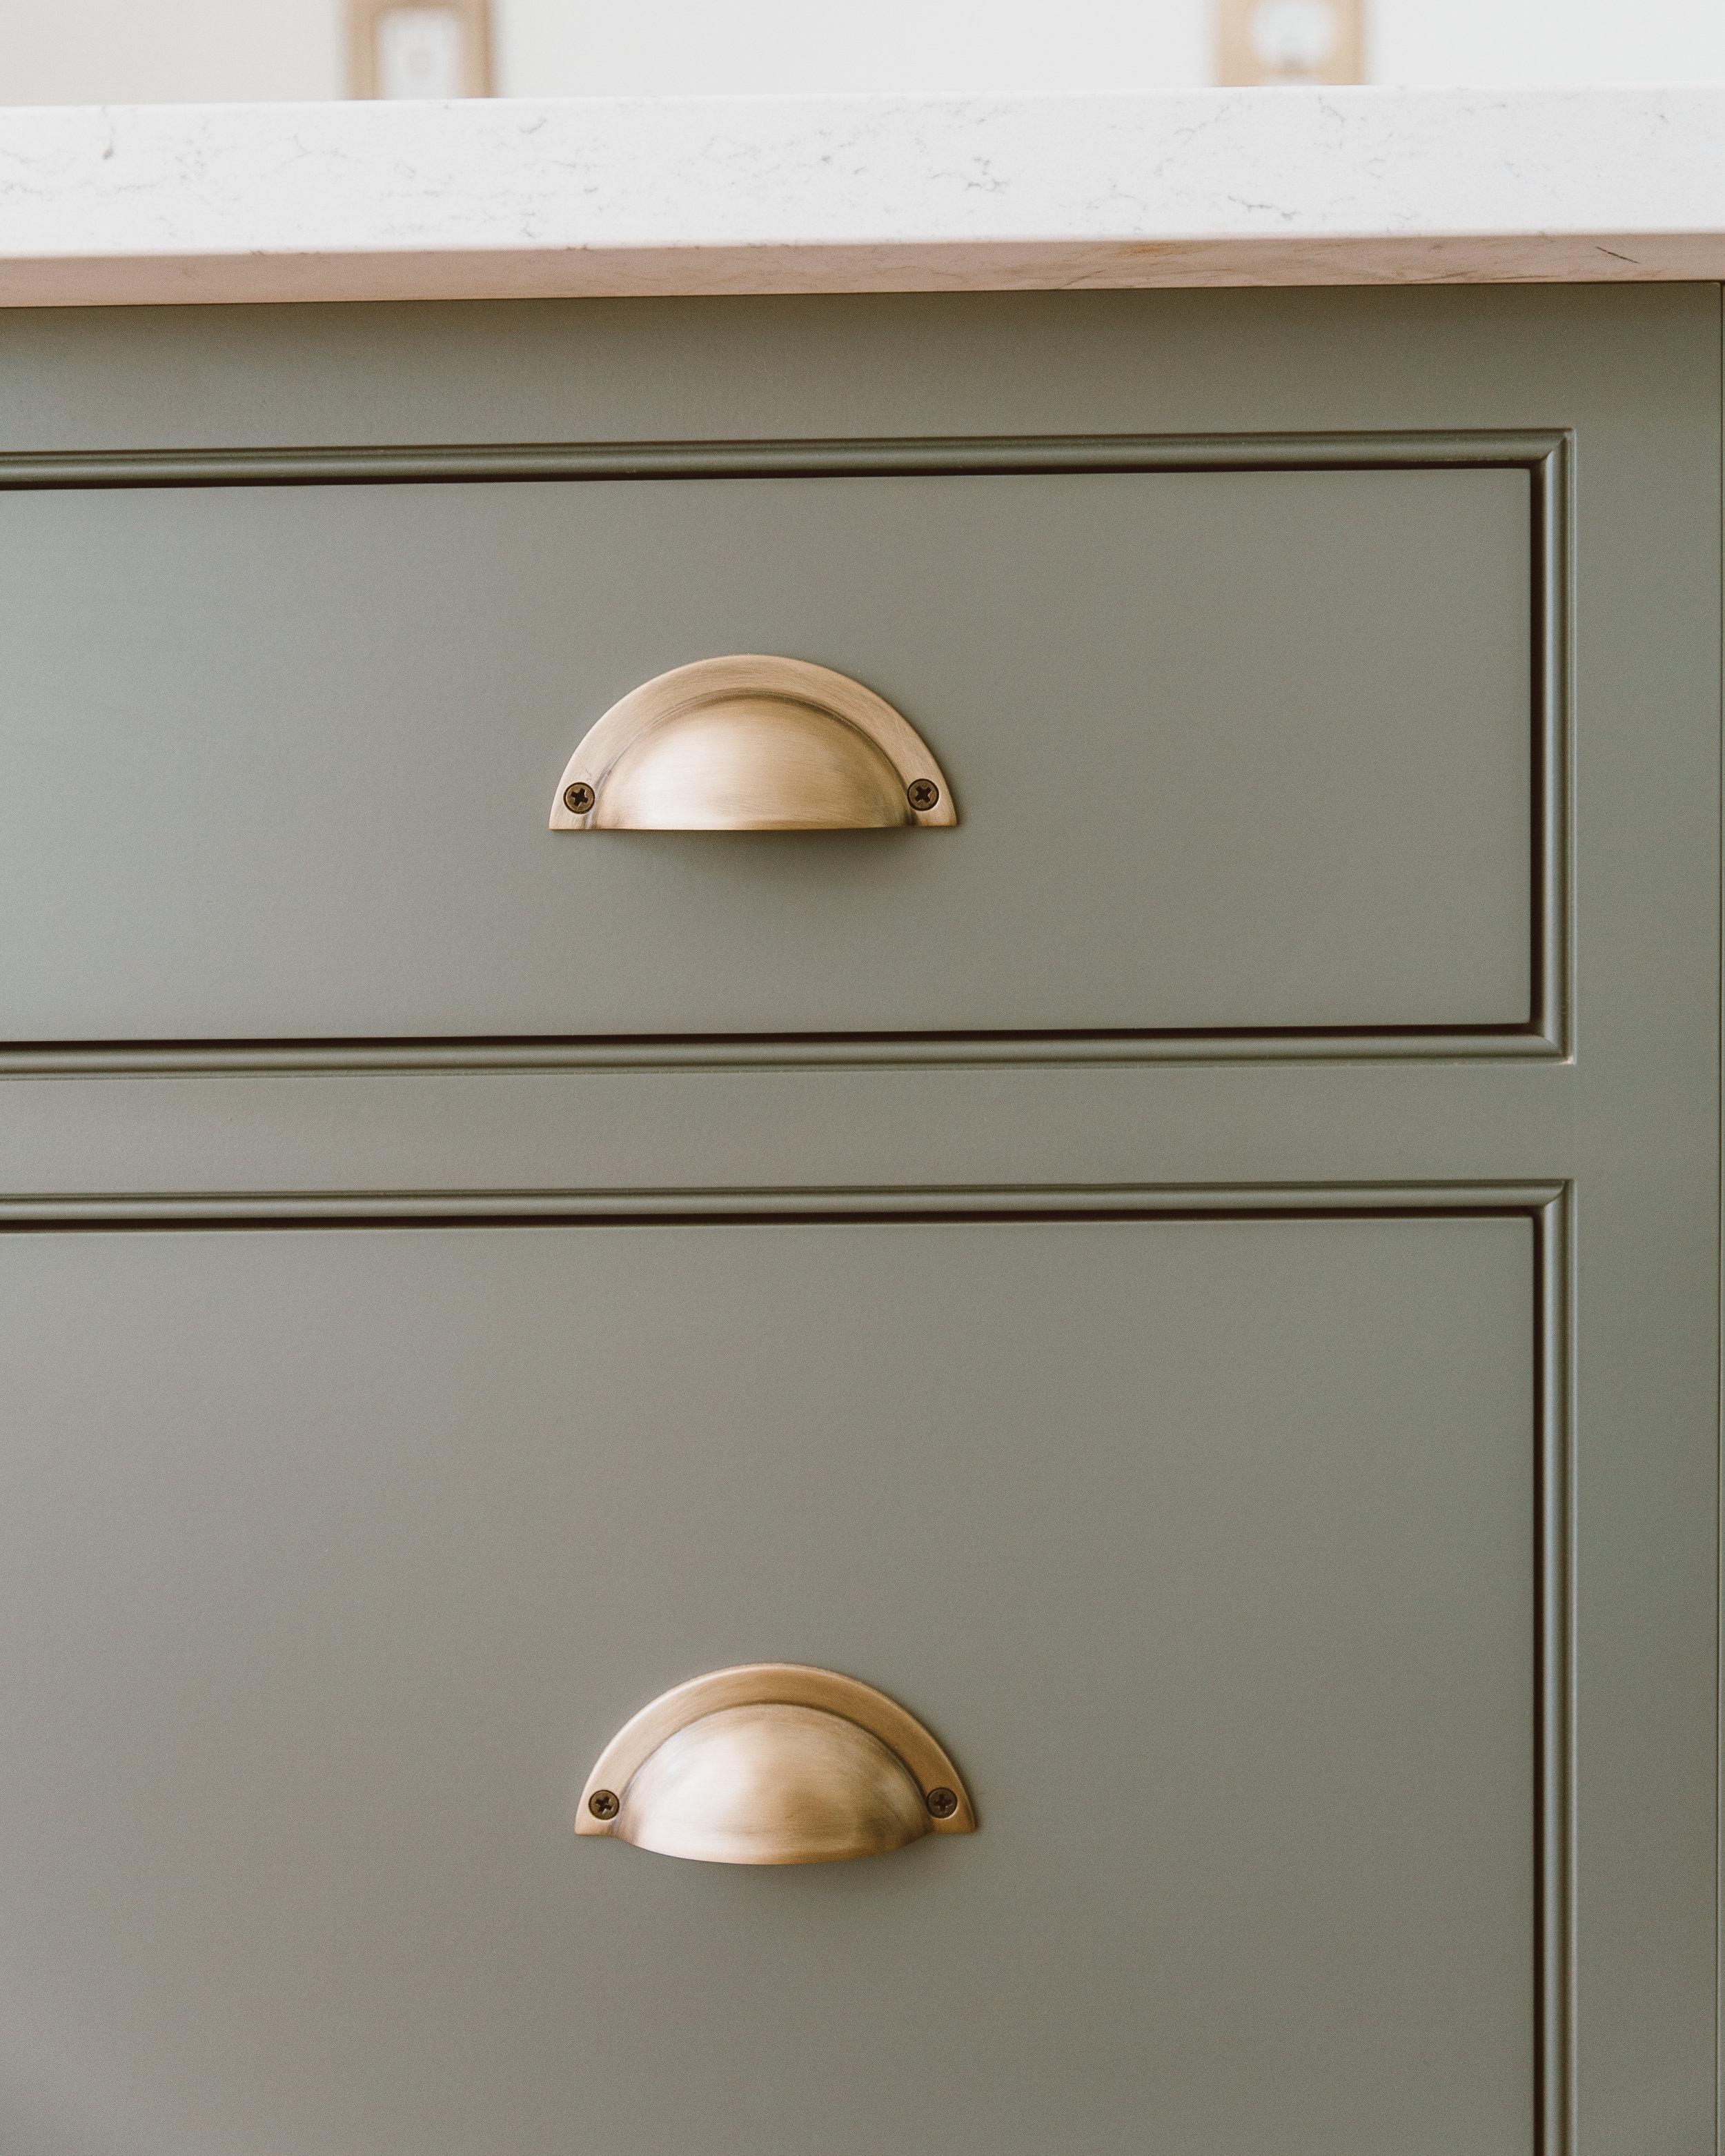 forthehome-nostalgic-warehouse-kitchen-cabinet-hardware05.jpg